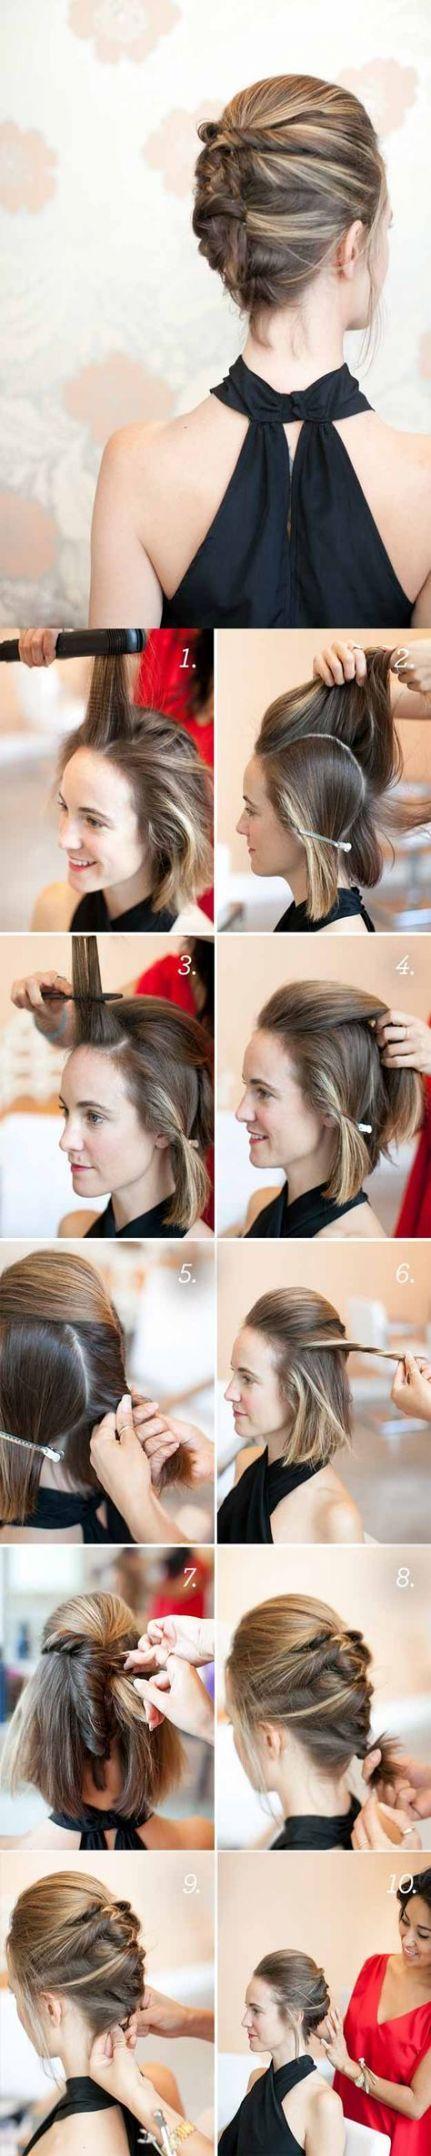 Haircut diy tutorials french twists 27+ trendy Ideas